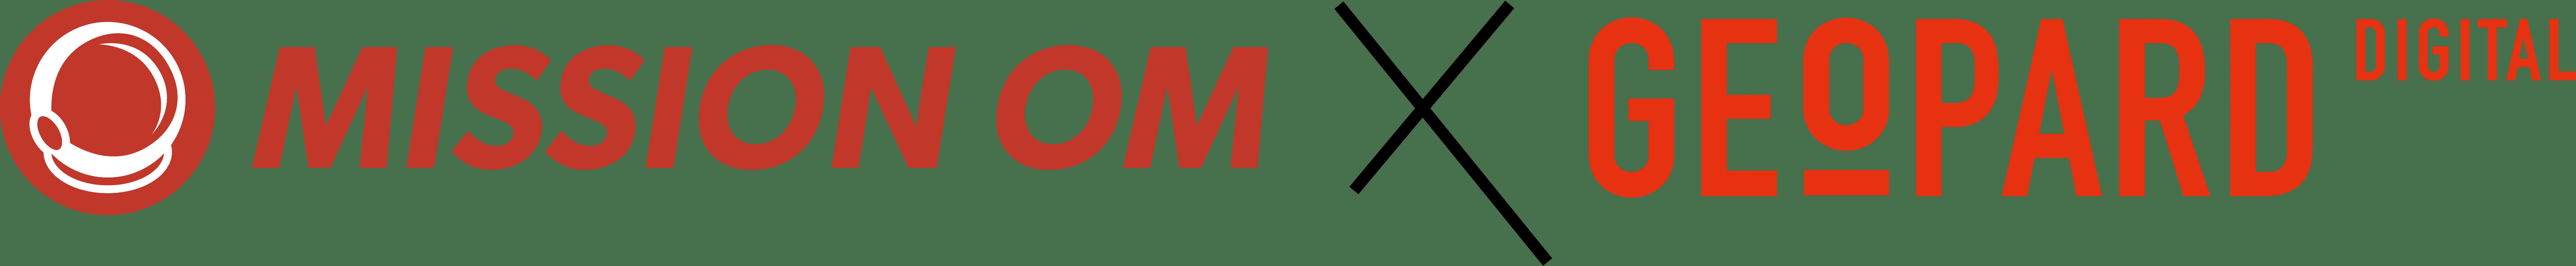 Mission OM X Geopard Digital